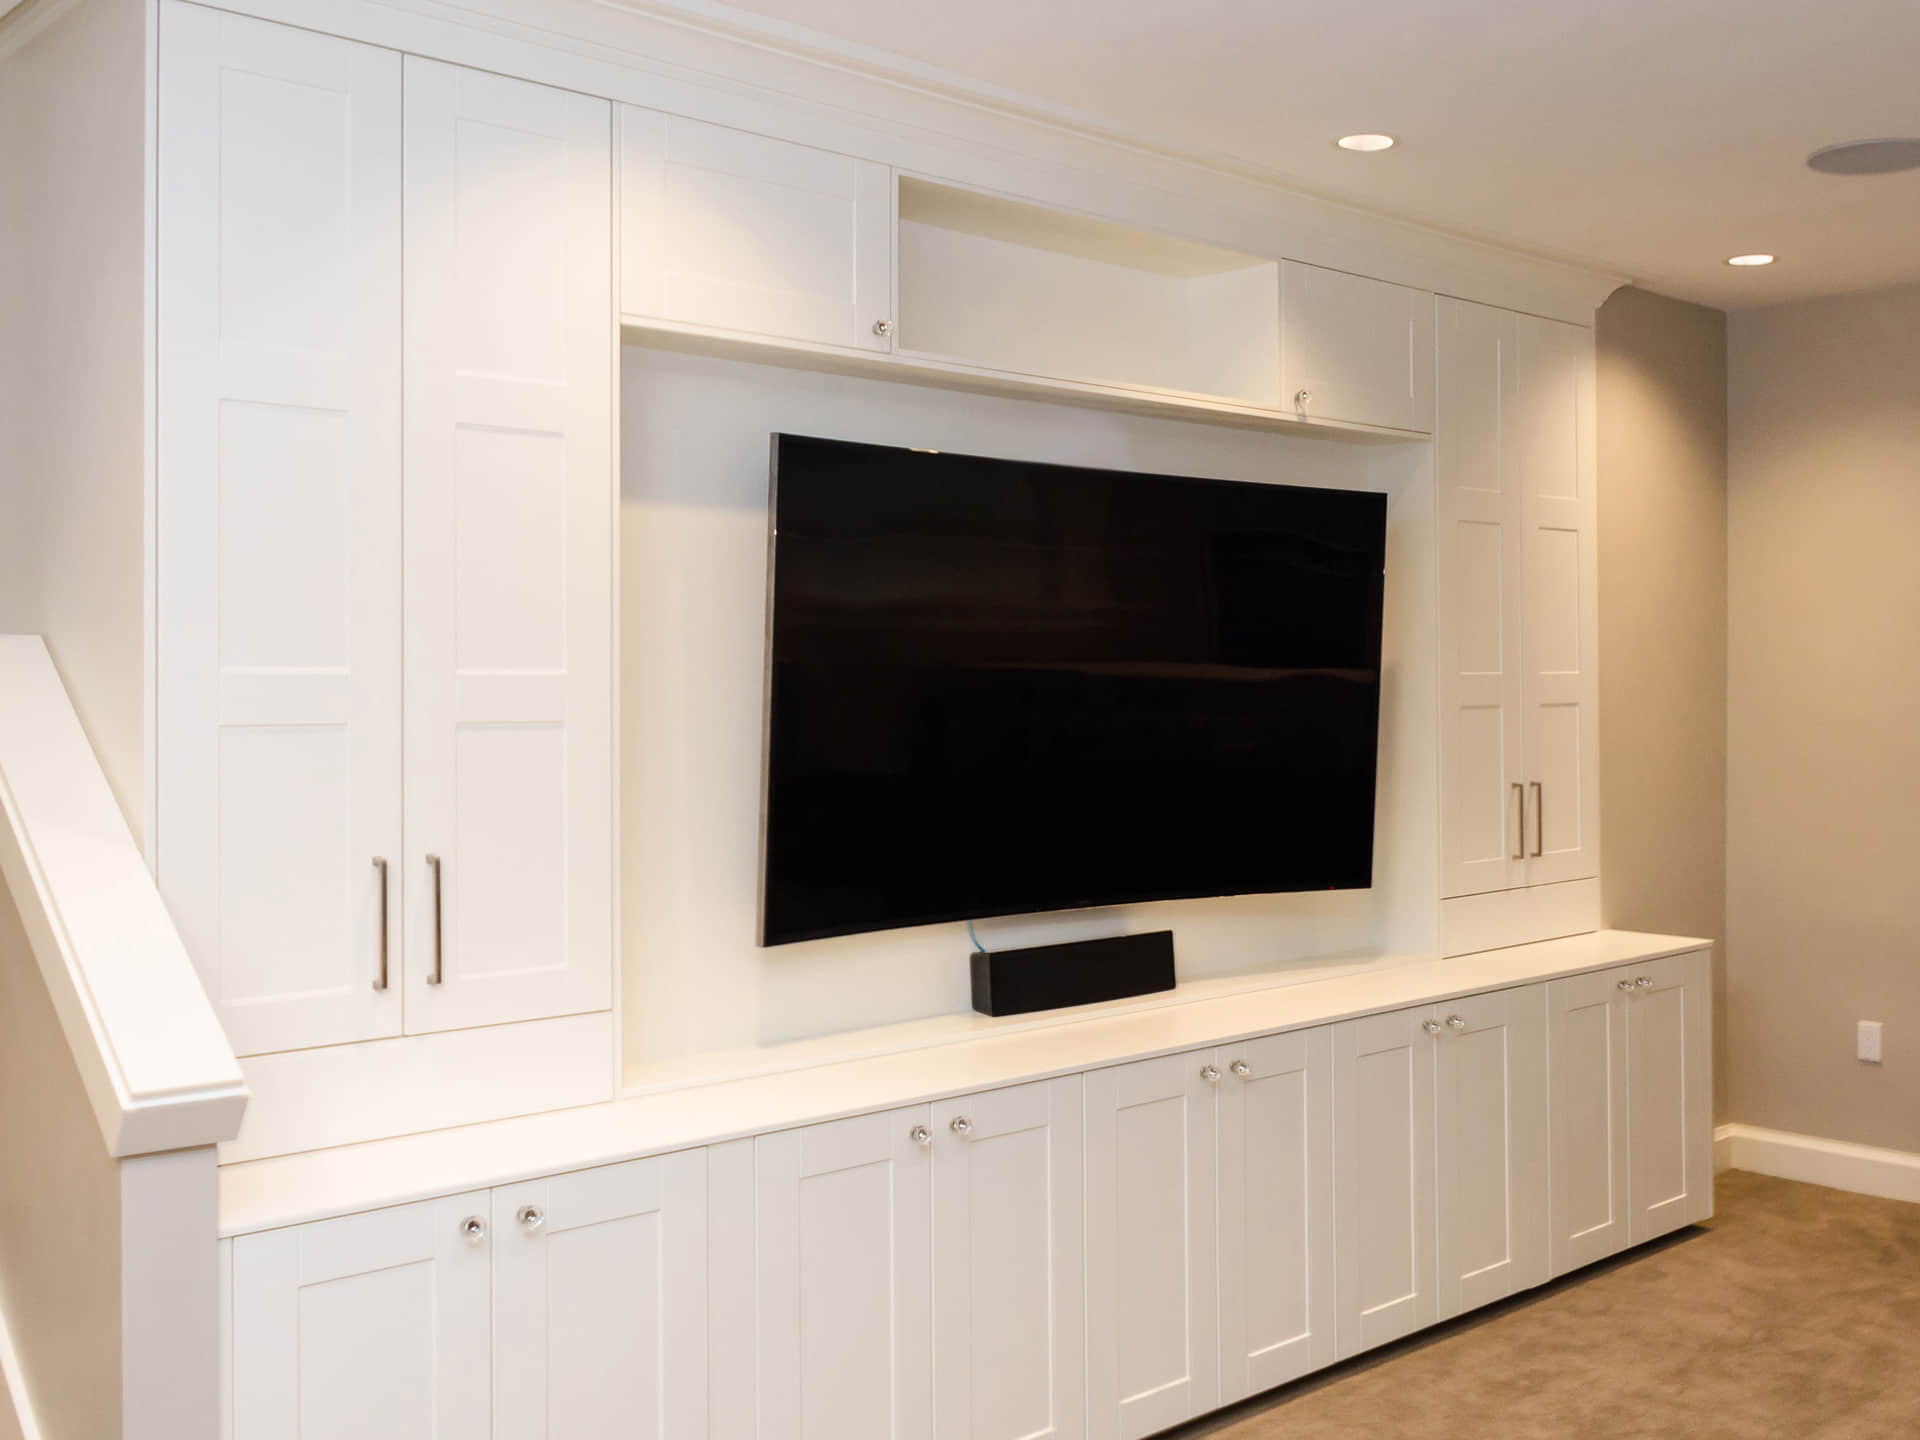 Design Idea - Living Room Entertainment Center